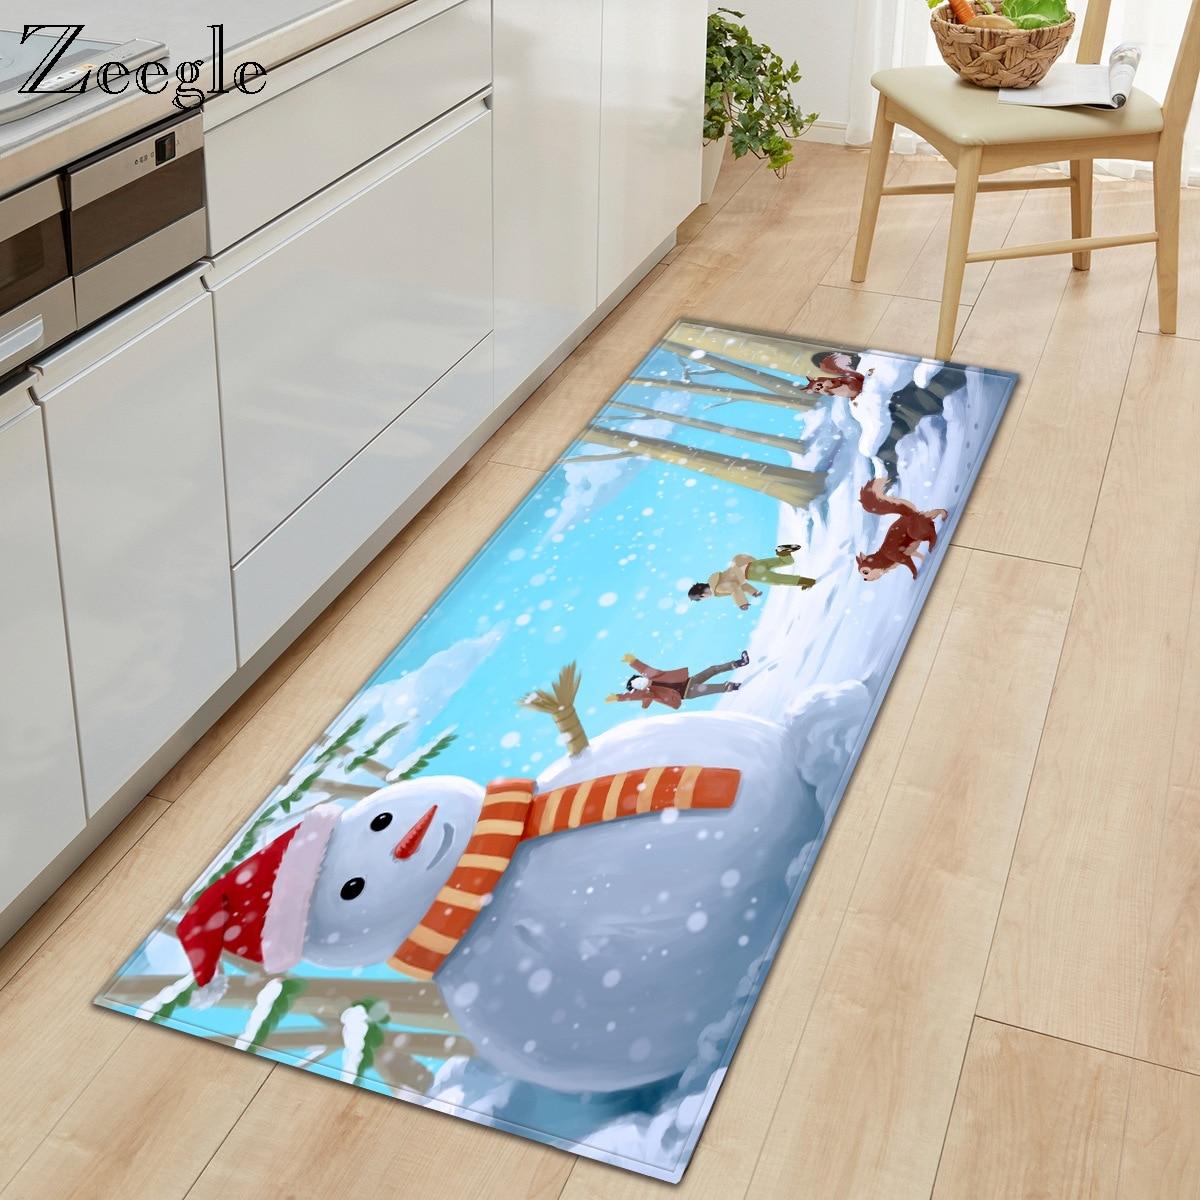 Zeegle Carpet Anti-slip Kitchen Rug Living Room Carpet Hallway Floor Mat Absorbent Bathroom Doormat Soft Bedside Carpet Mat